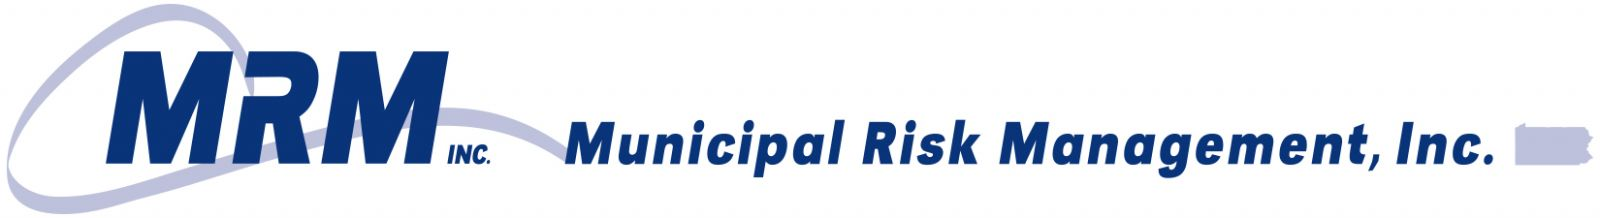 Municipal Risk Management logo